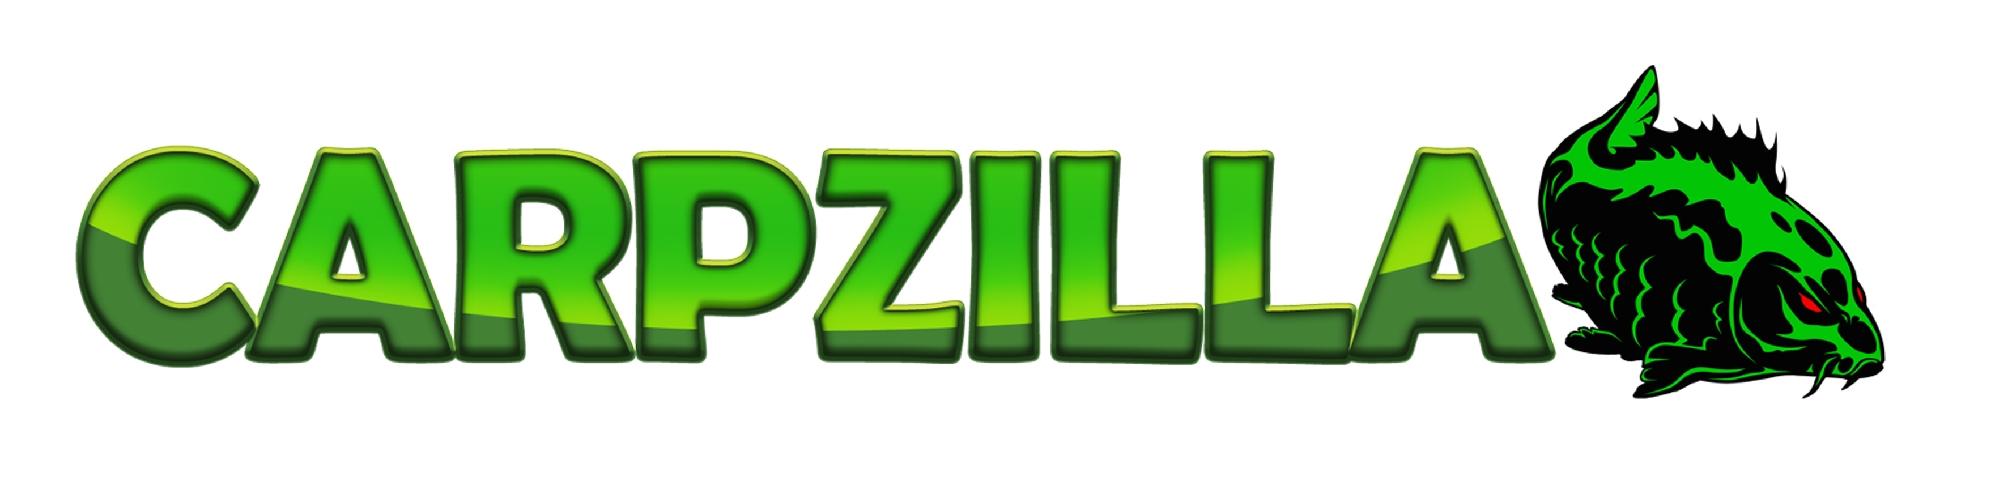 Carpzilla